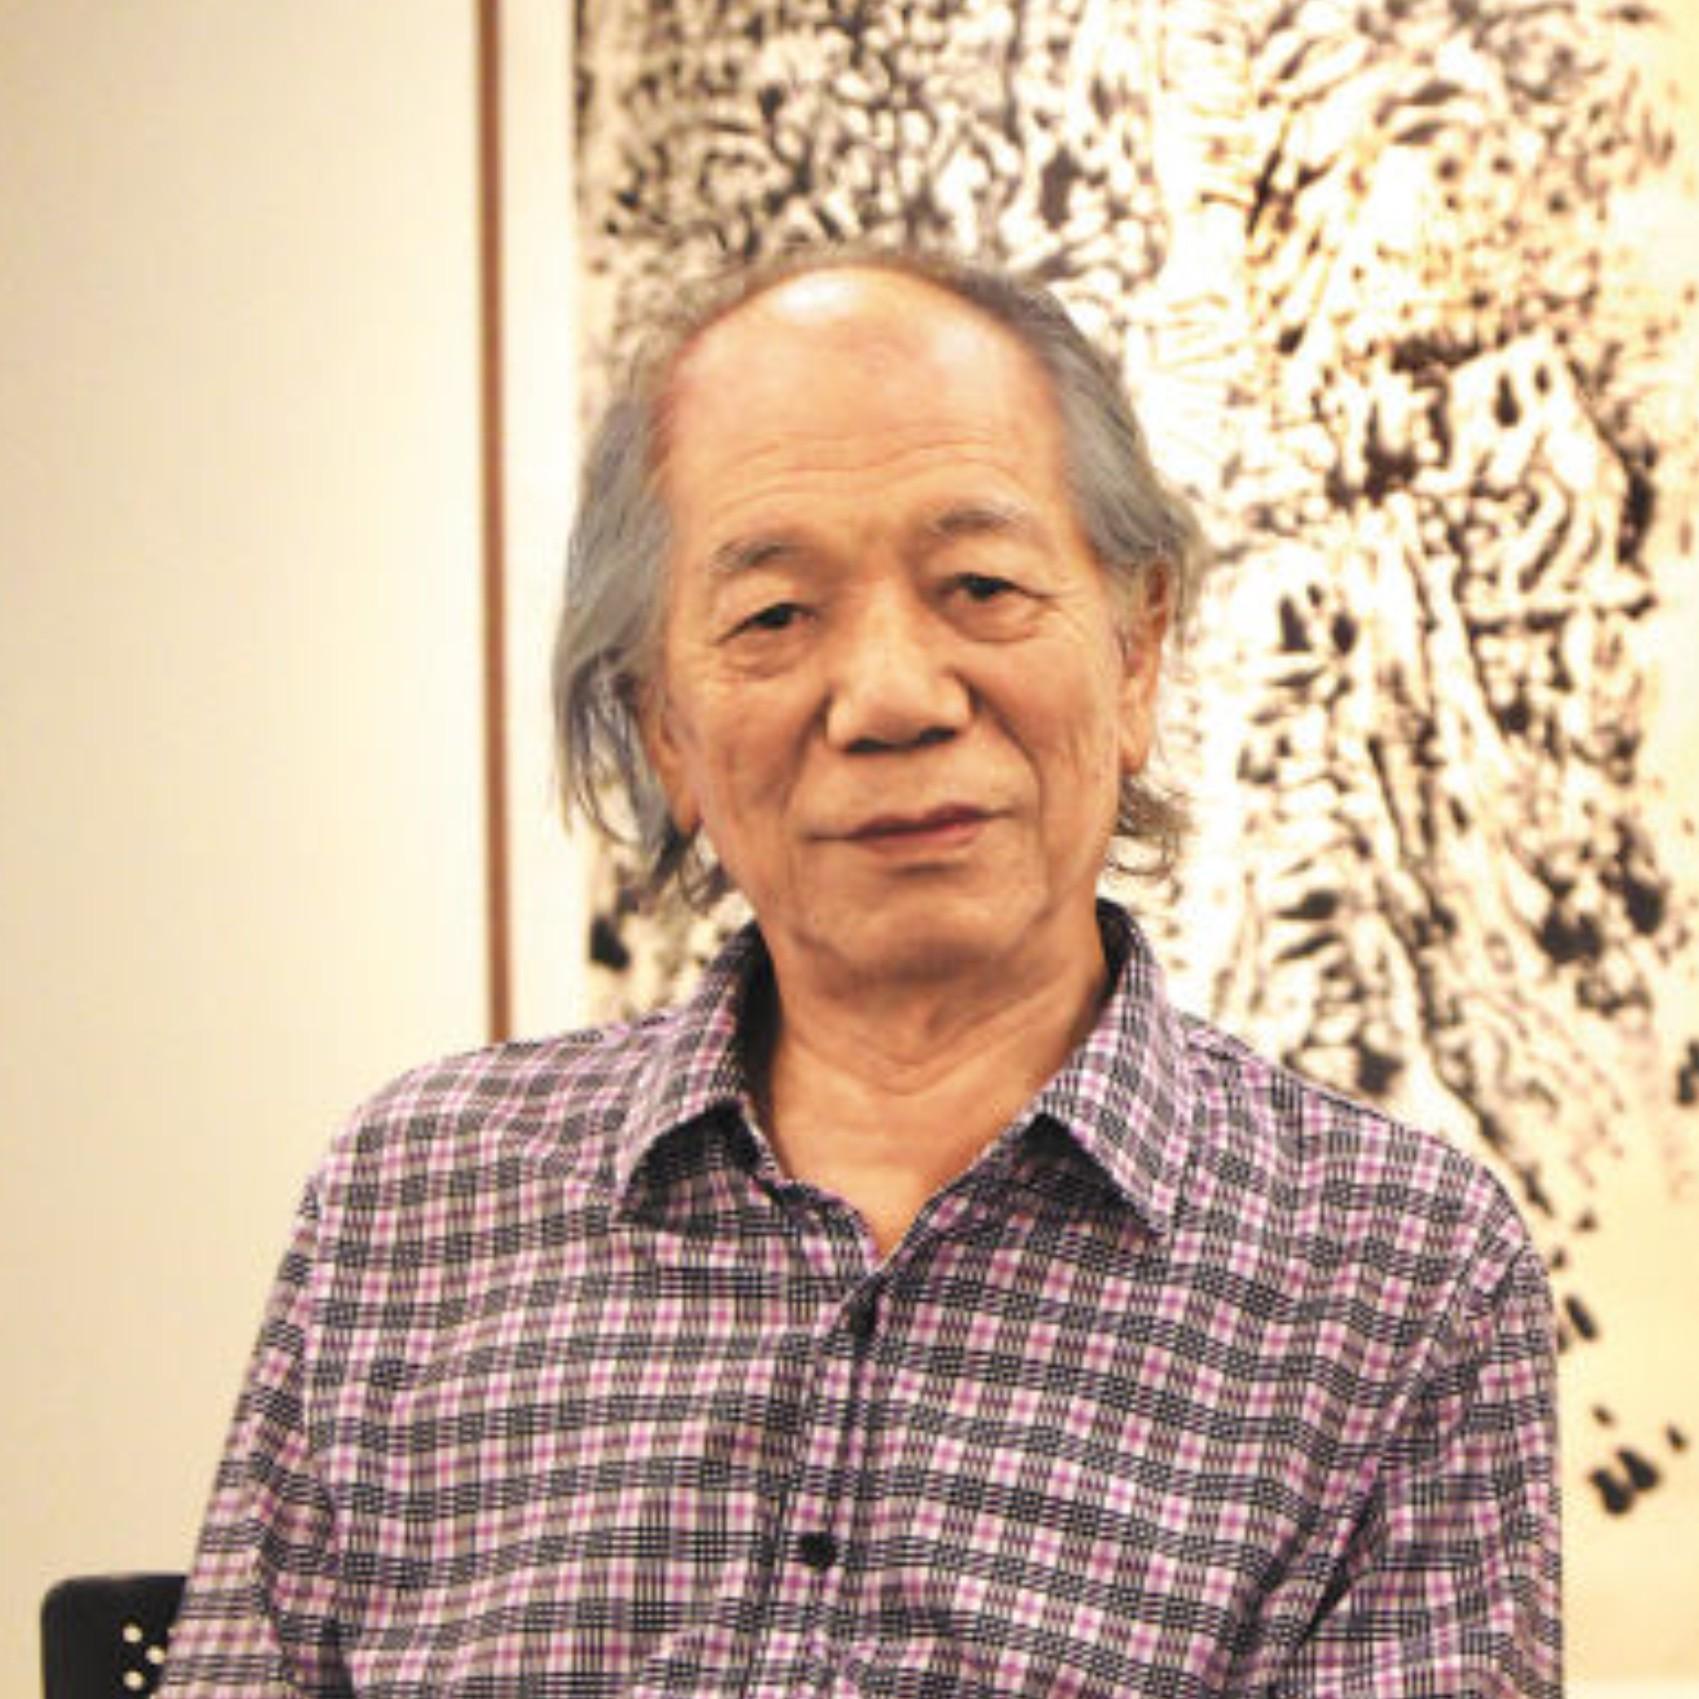 <h3>崔振宽</h3><p>1935年7月1日生,陕西西安人。1960年毕业于西安美术学院国画系并留校任教。1962年任西安特种工艺美术厂工艺美术师。1983年任陕西国画院画家,现为该院一级美术师。</p><p></p>